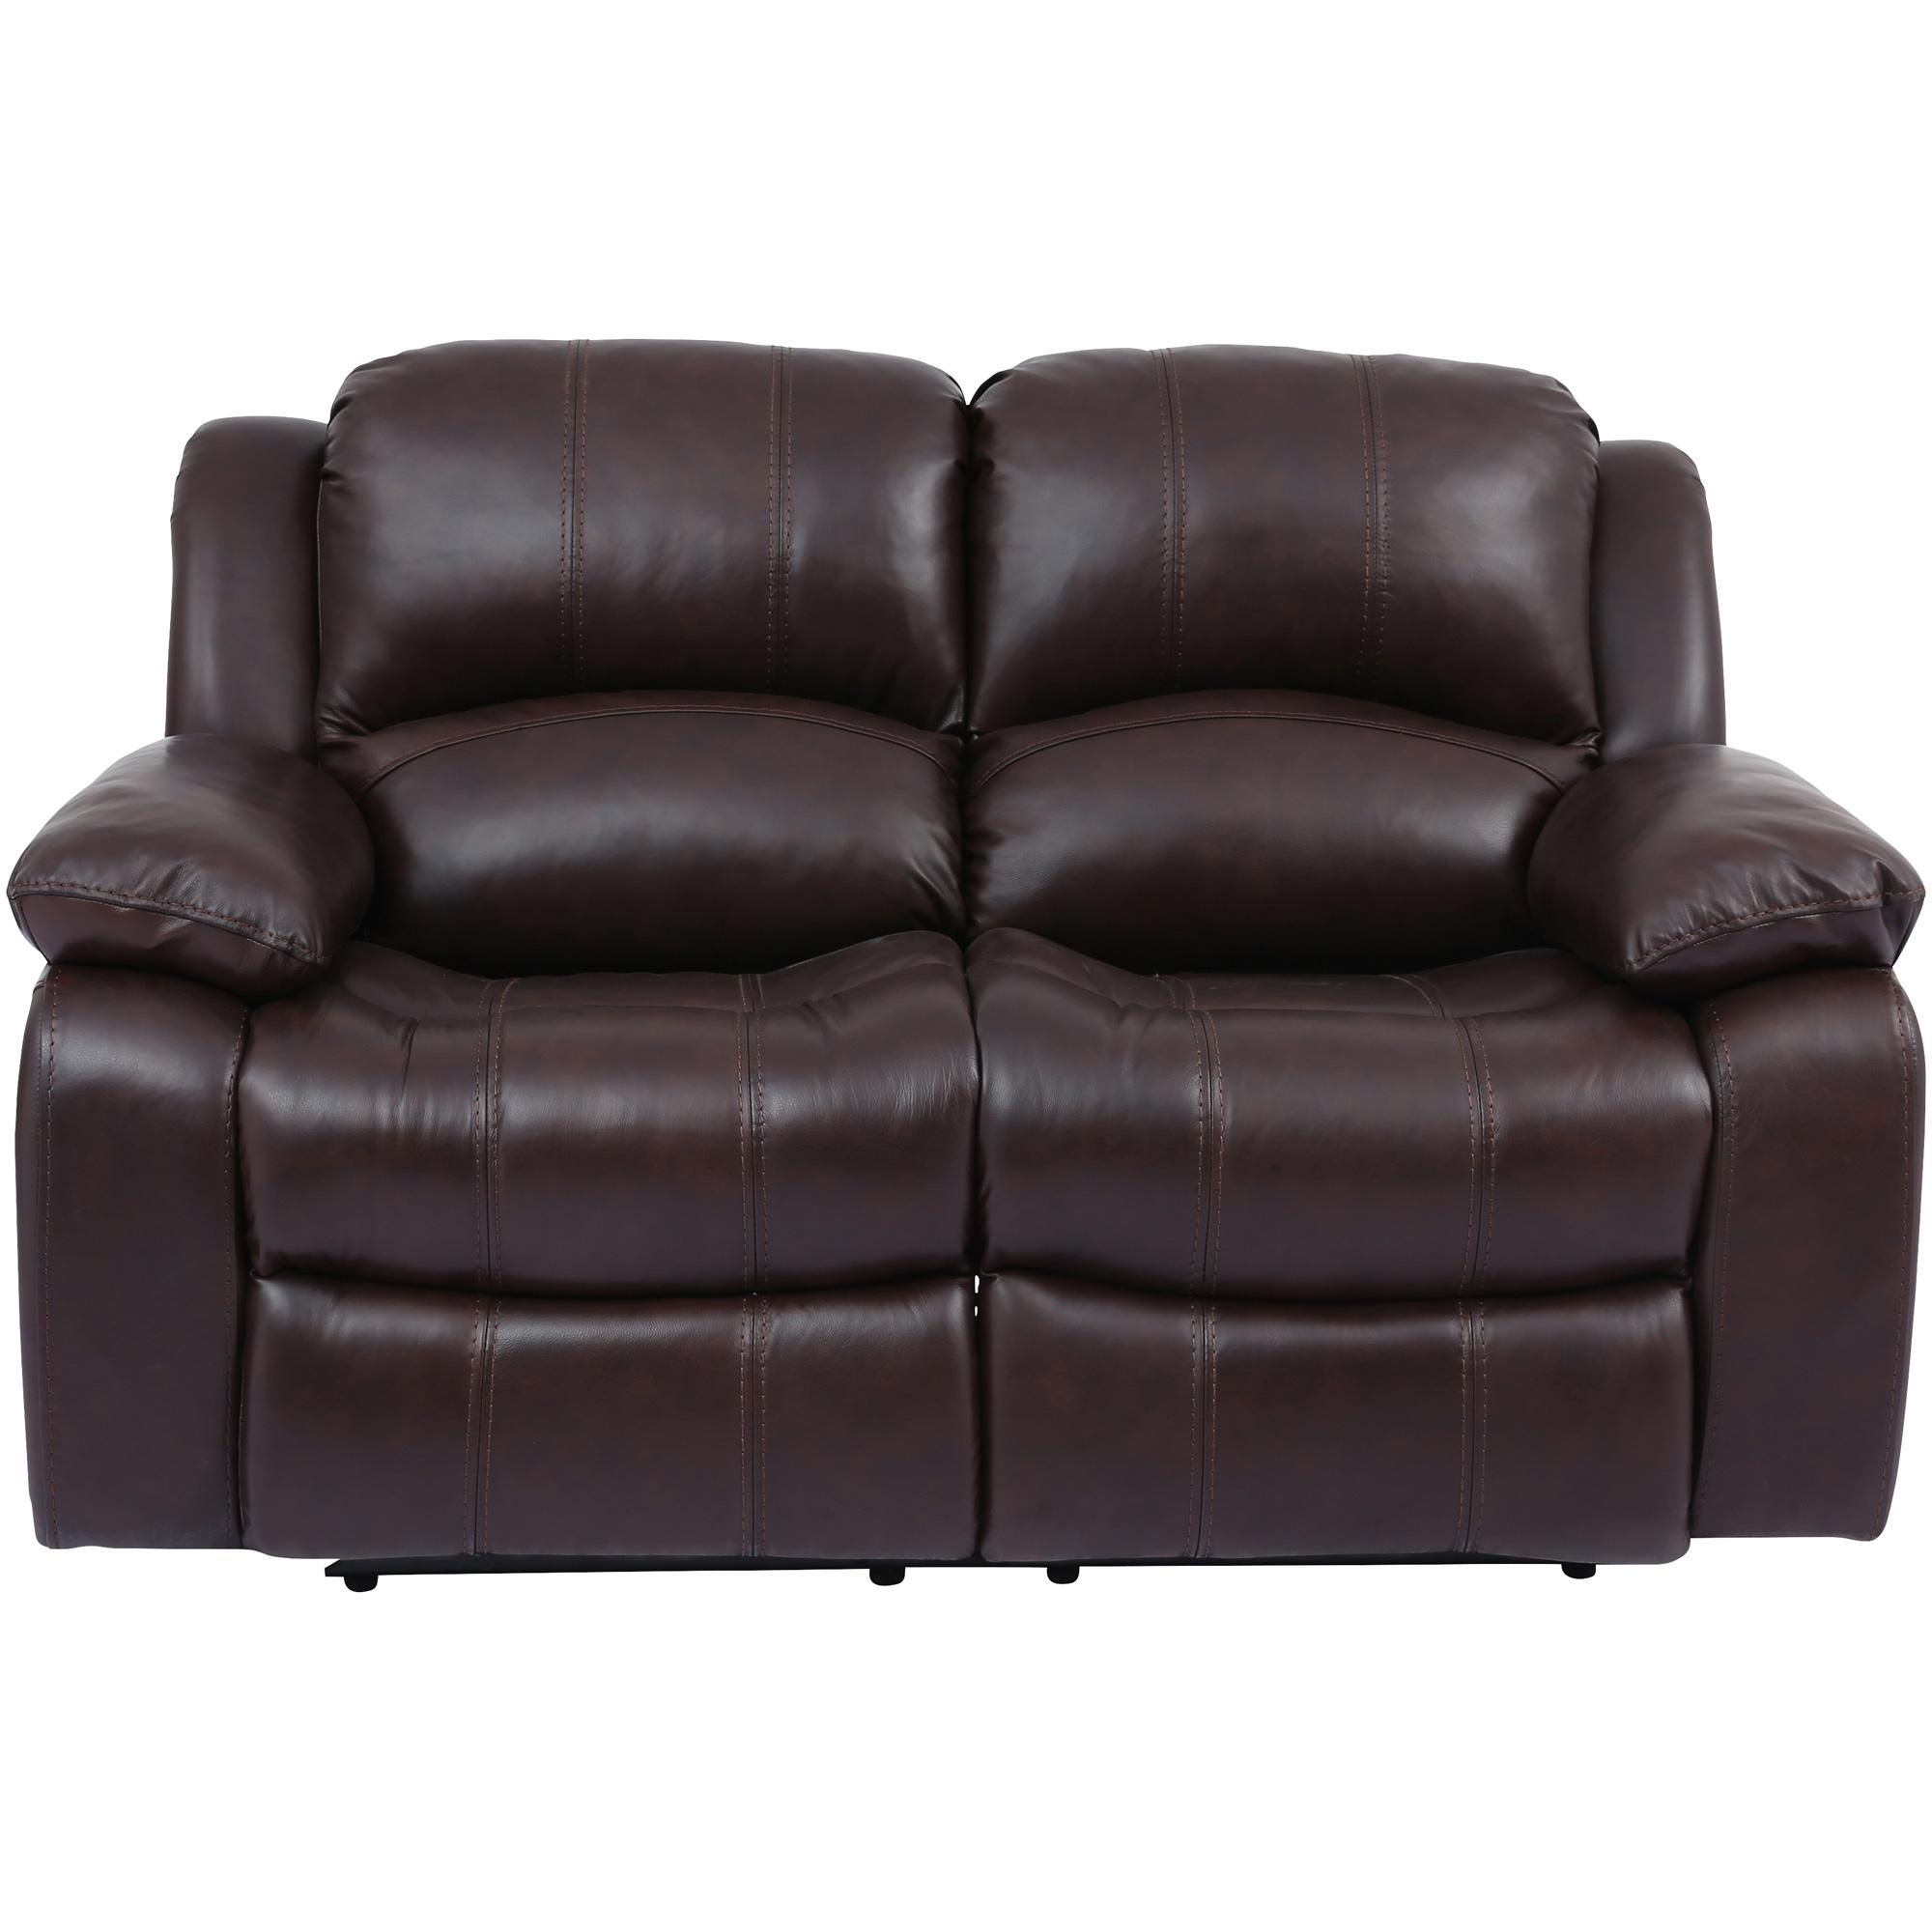 Wah Cheers | Ender Brown Leather Reclining Loveseat Sofa